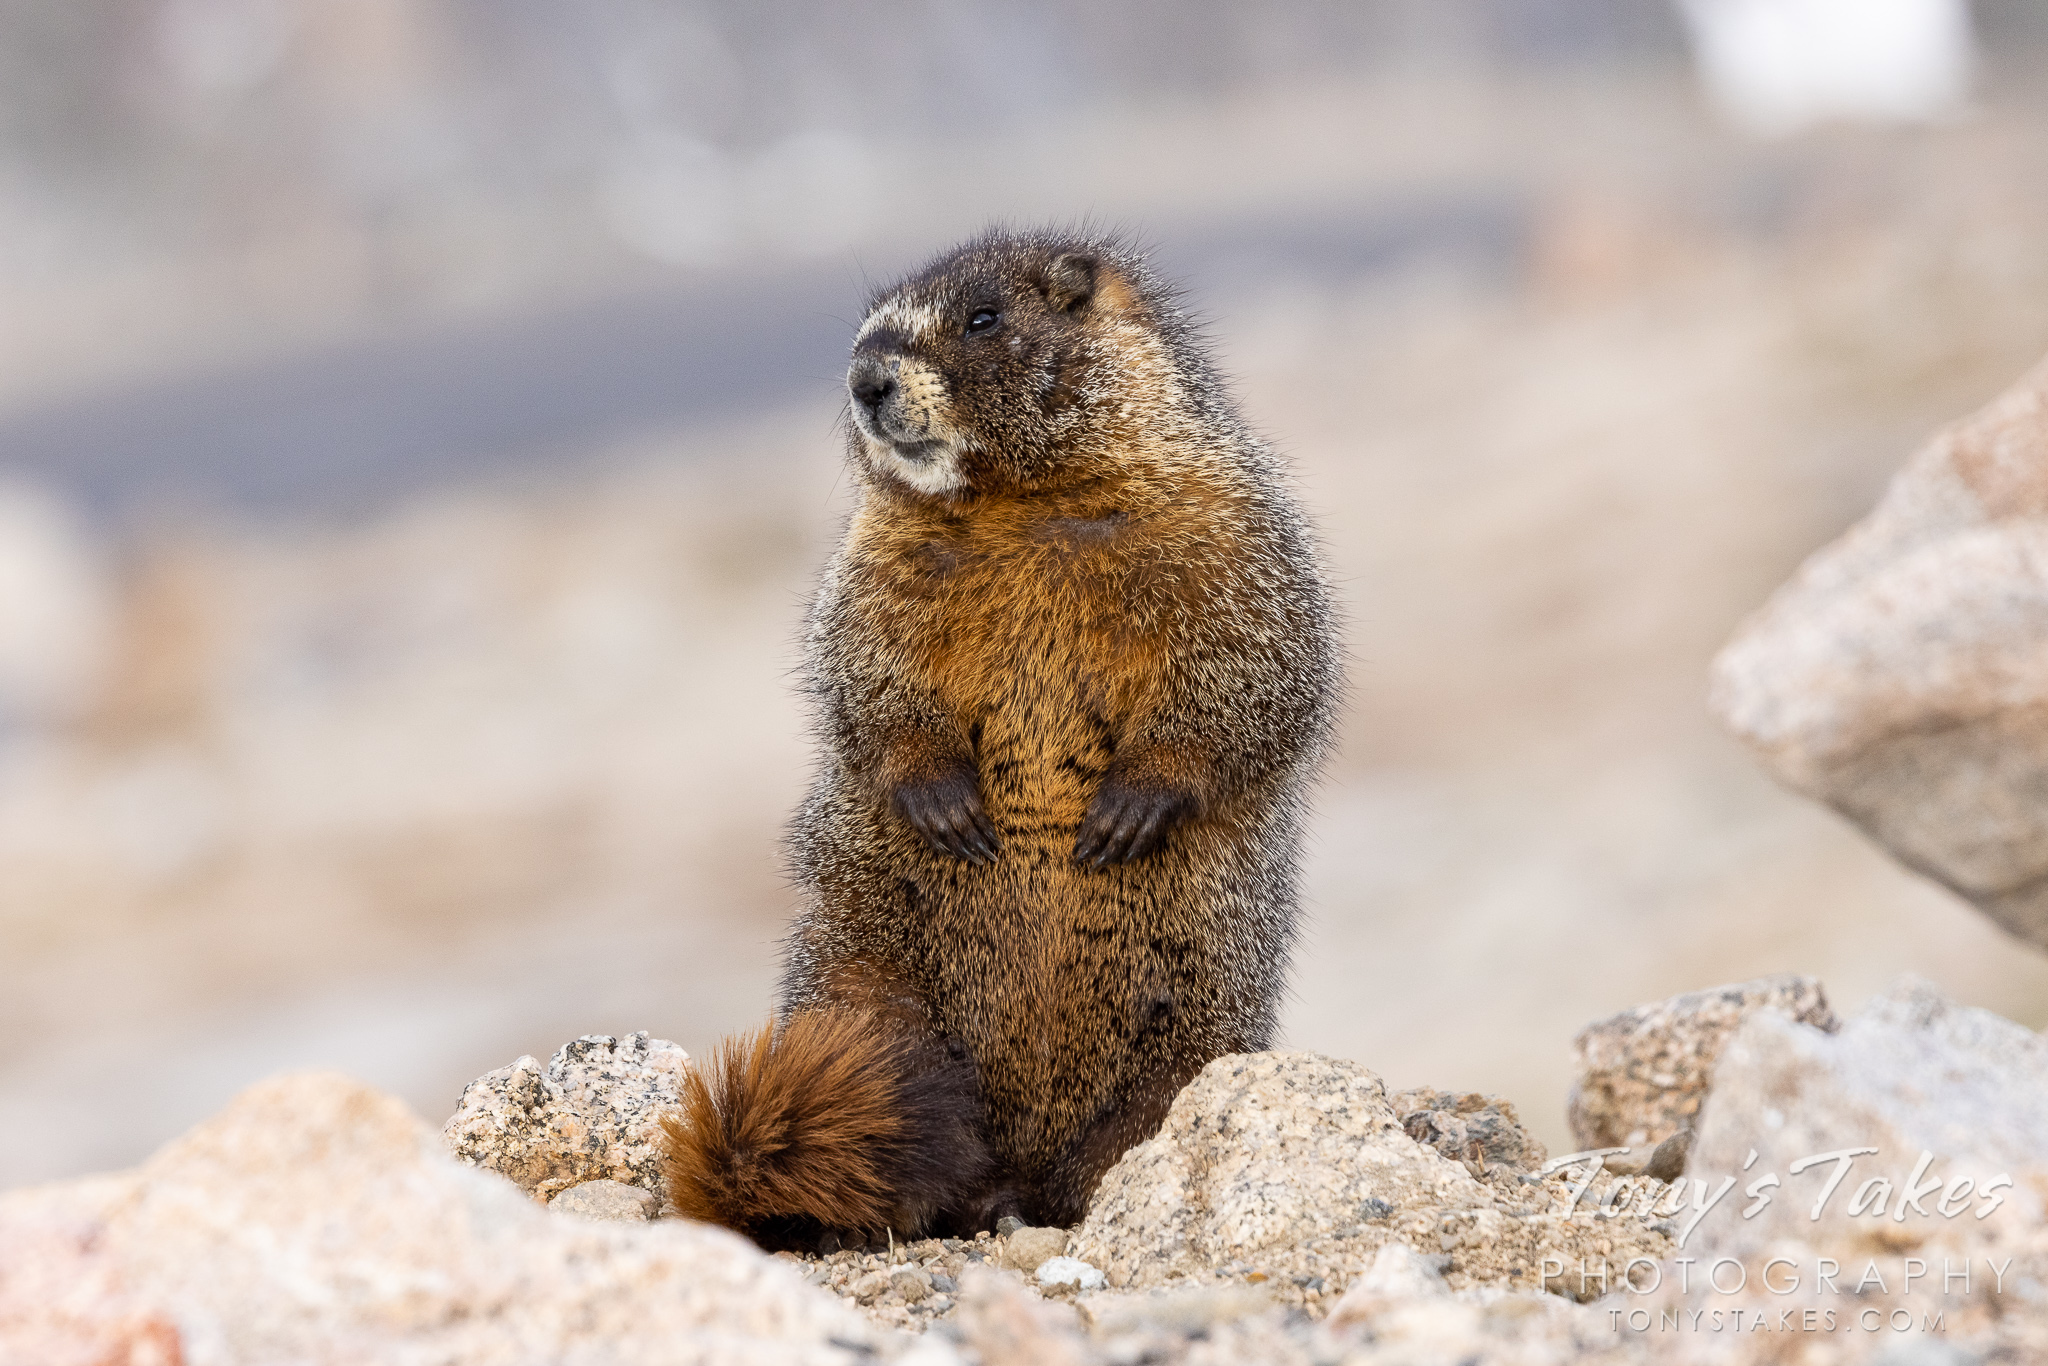 Marmot sits up, strikes a pose